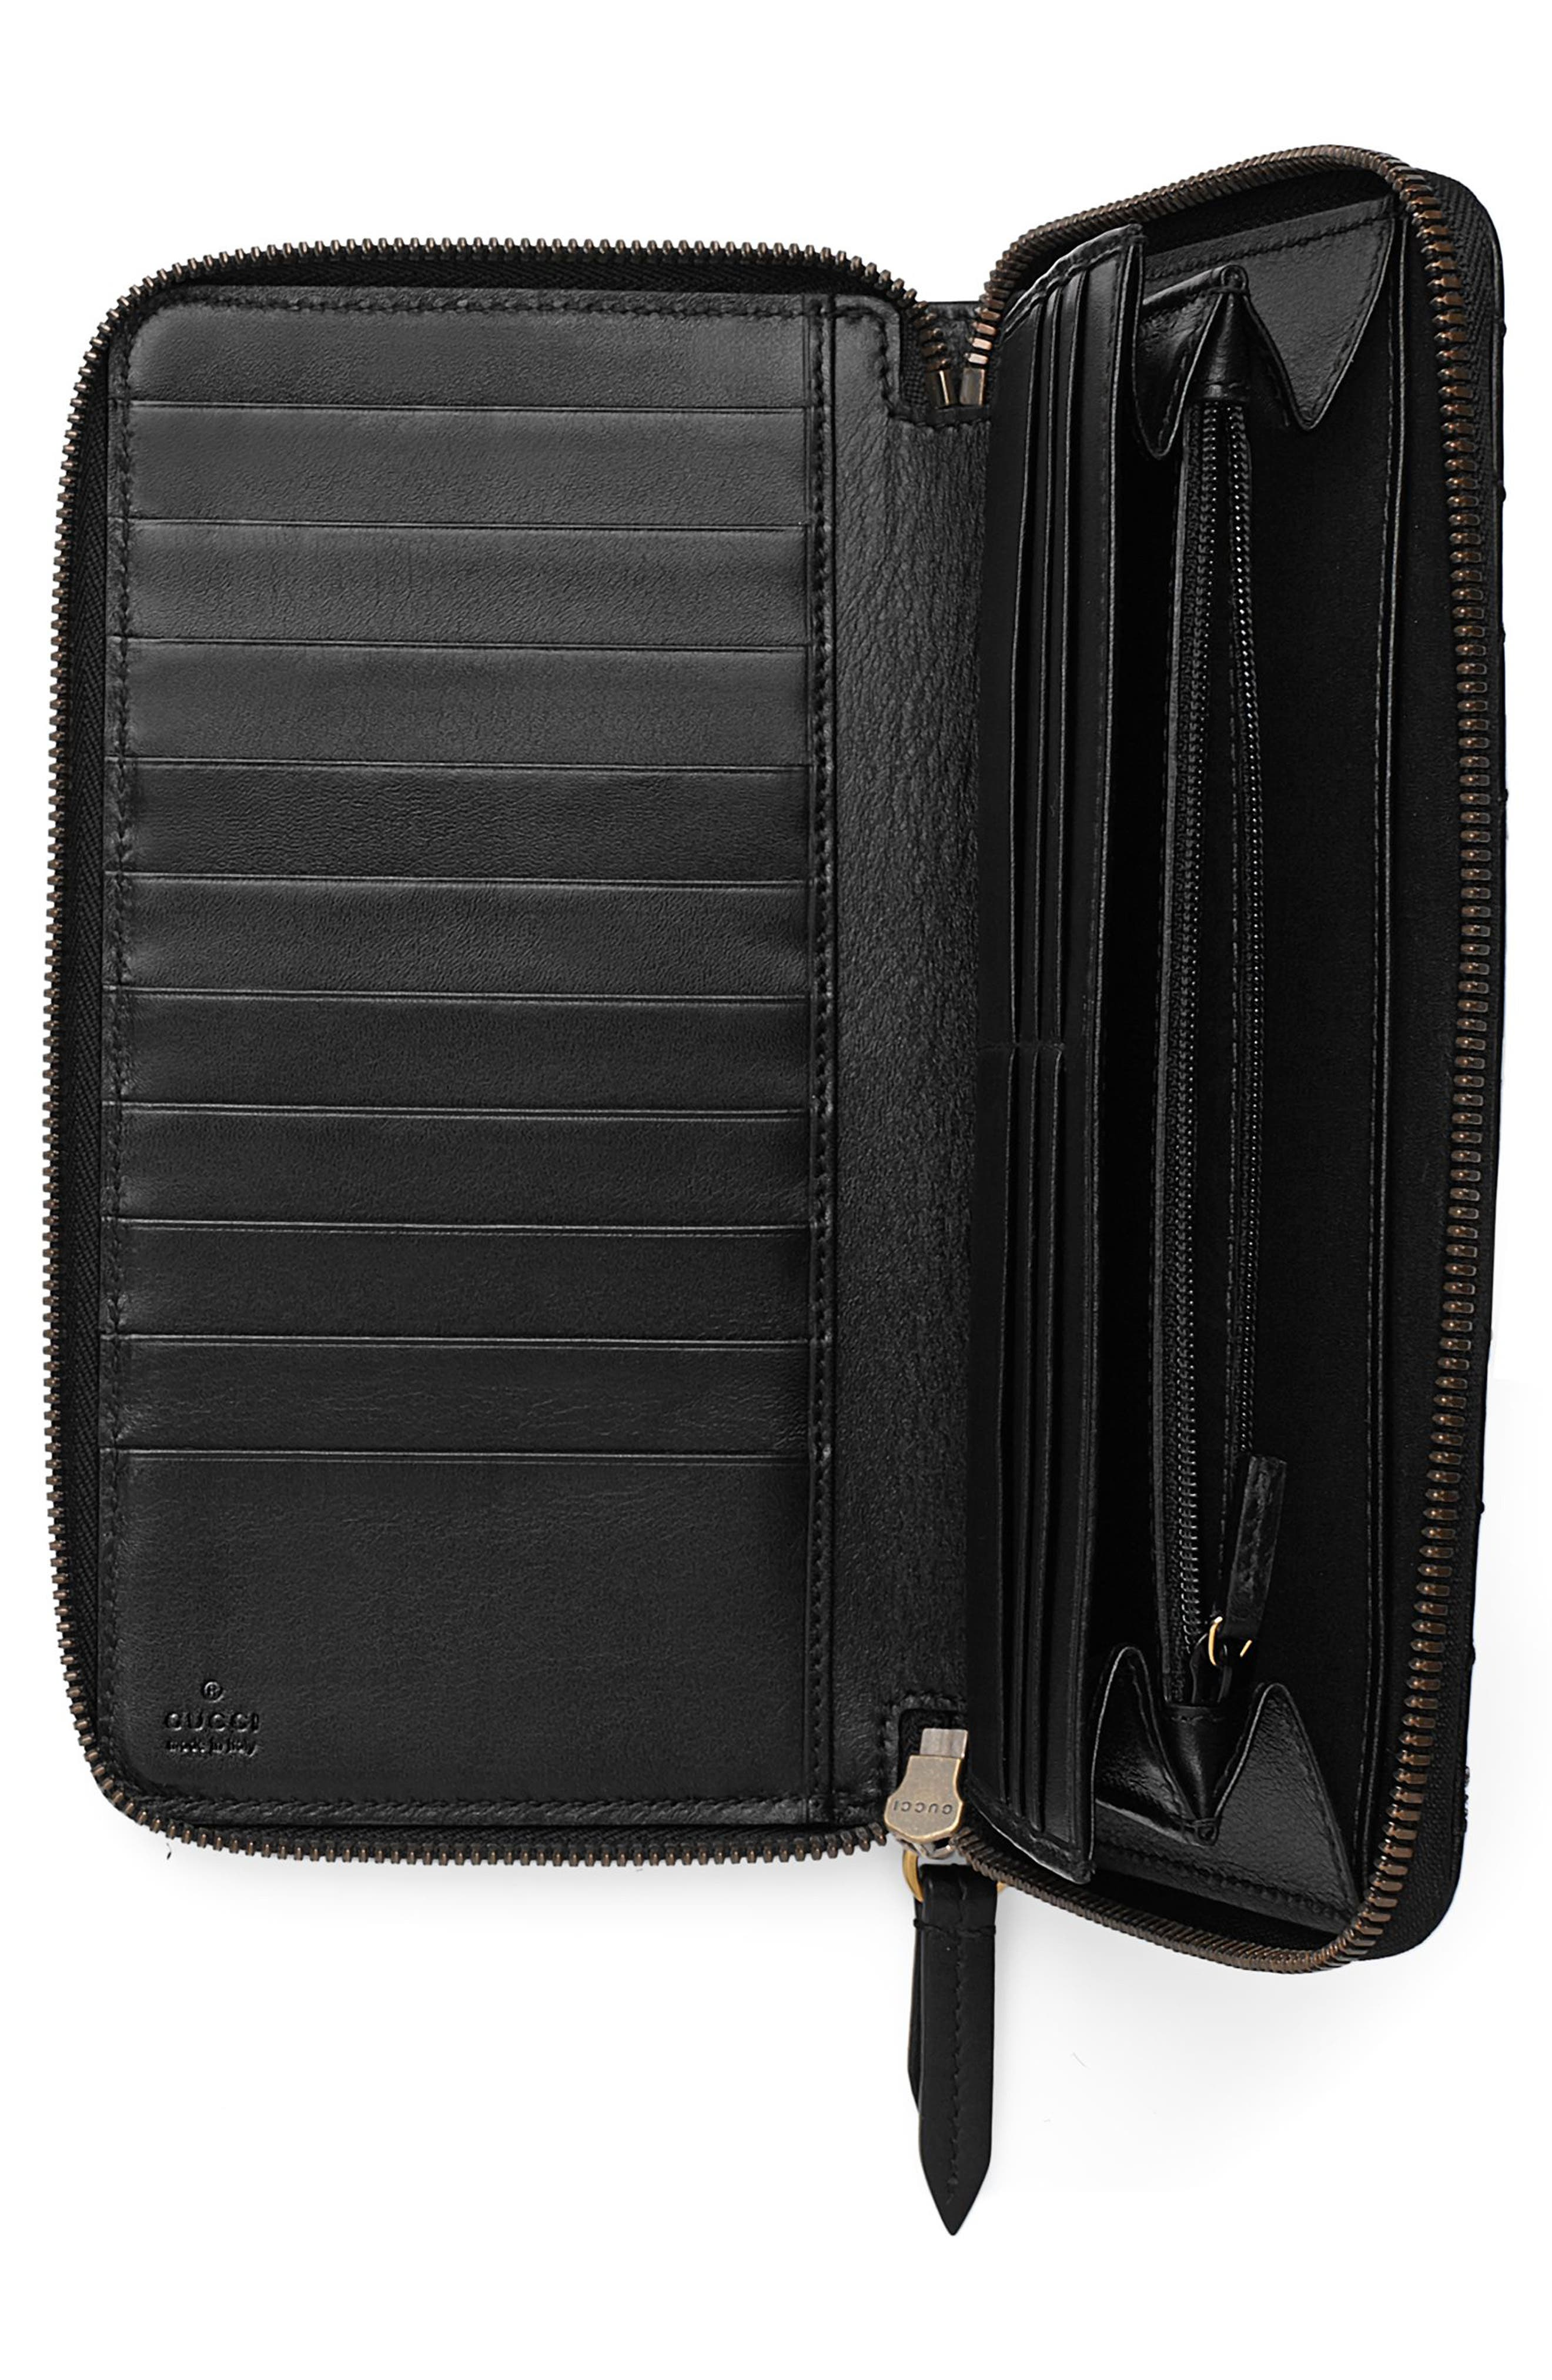 Alternate Image 2  - Gucci GG Marmont Matelassé Leather Zip-Around Wallet